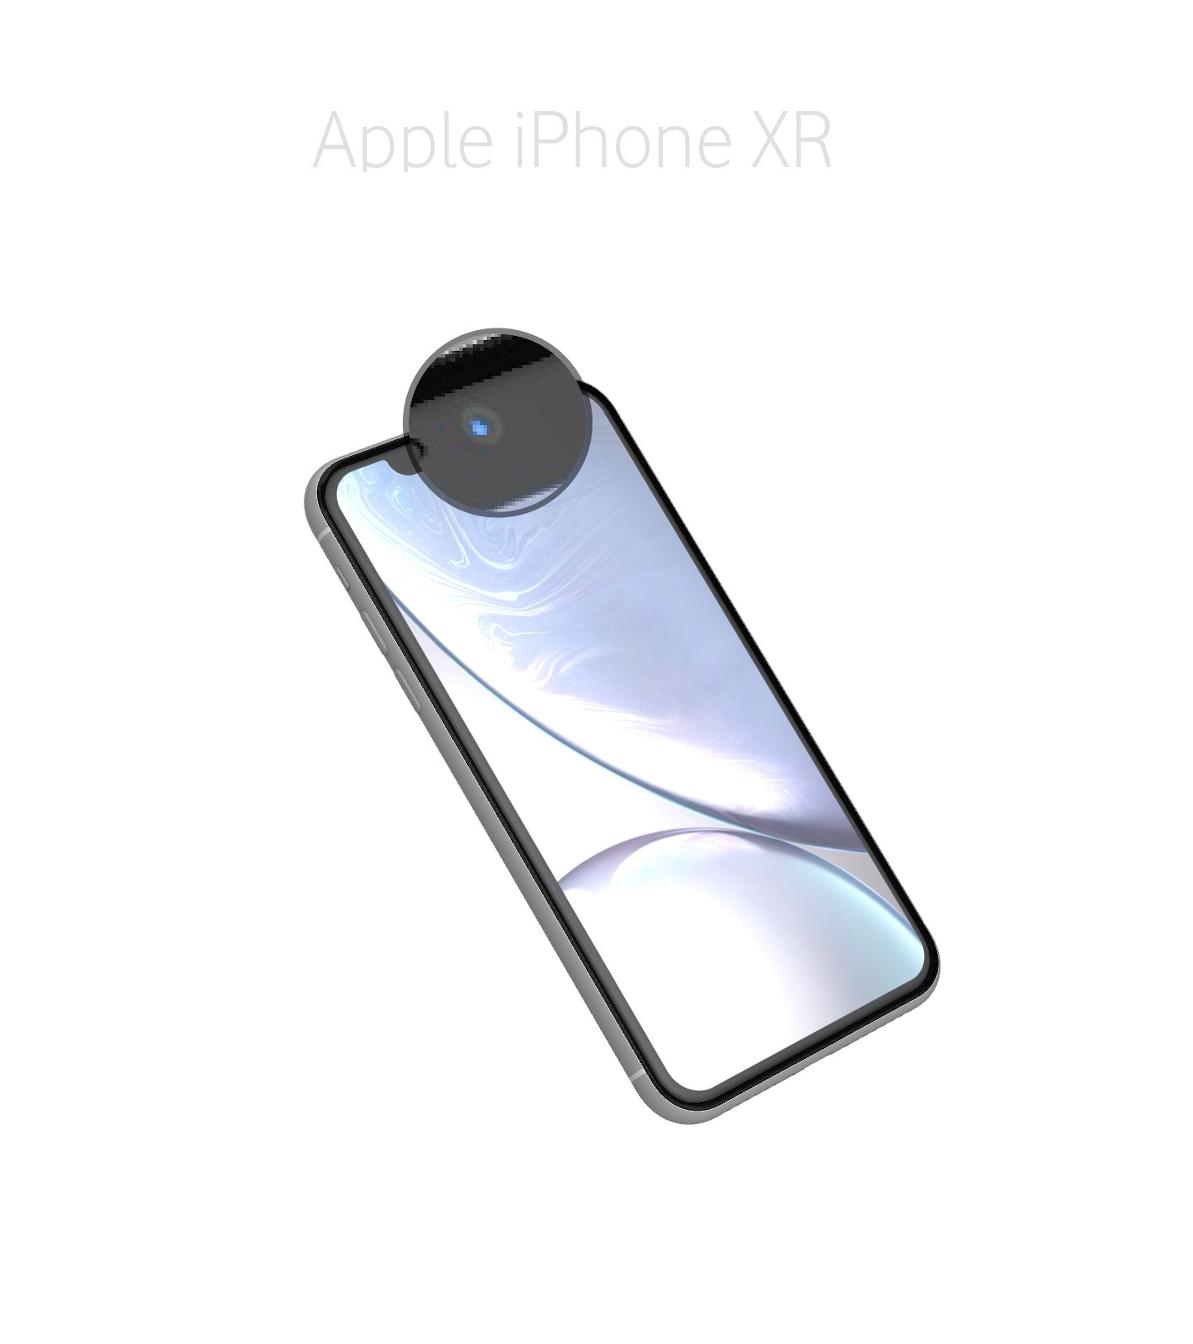 Laga kamera (selfie) iPhone XR